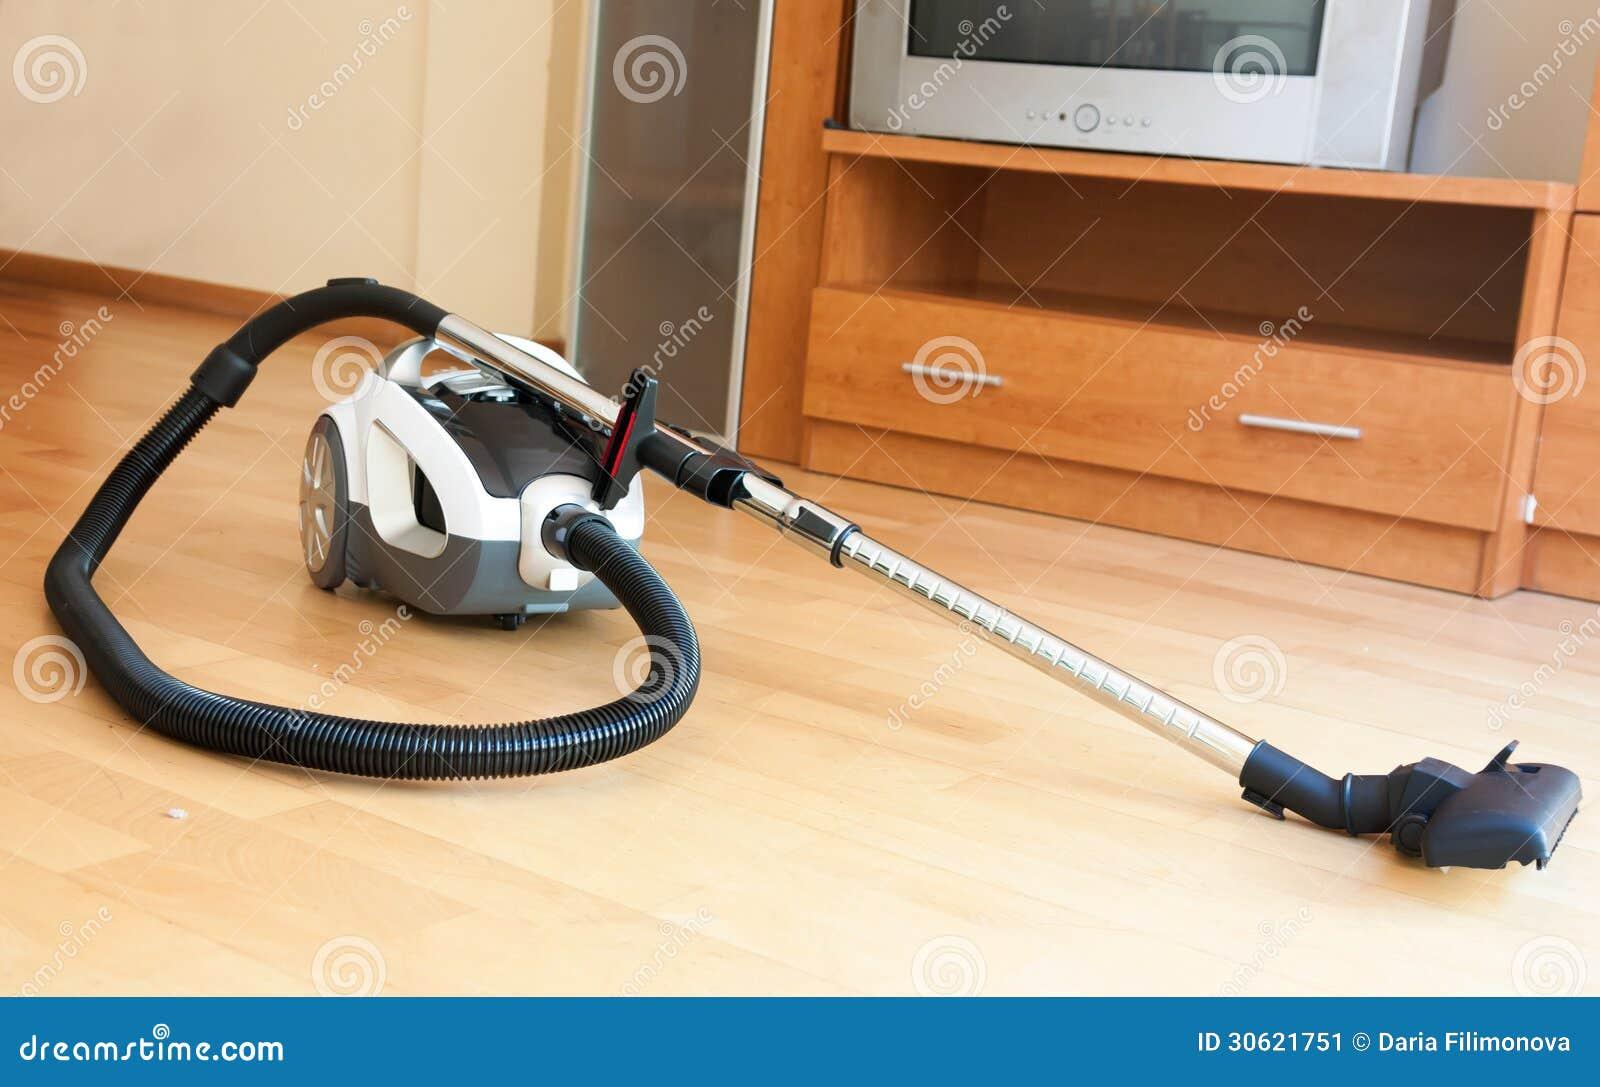 white vacuum cleaner on parquet stock image image 30621751